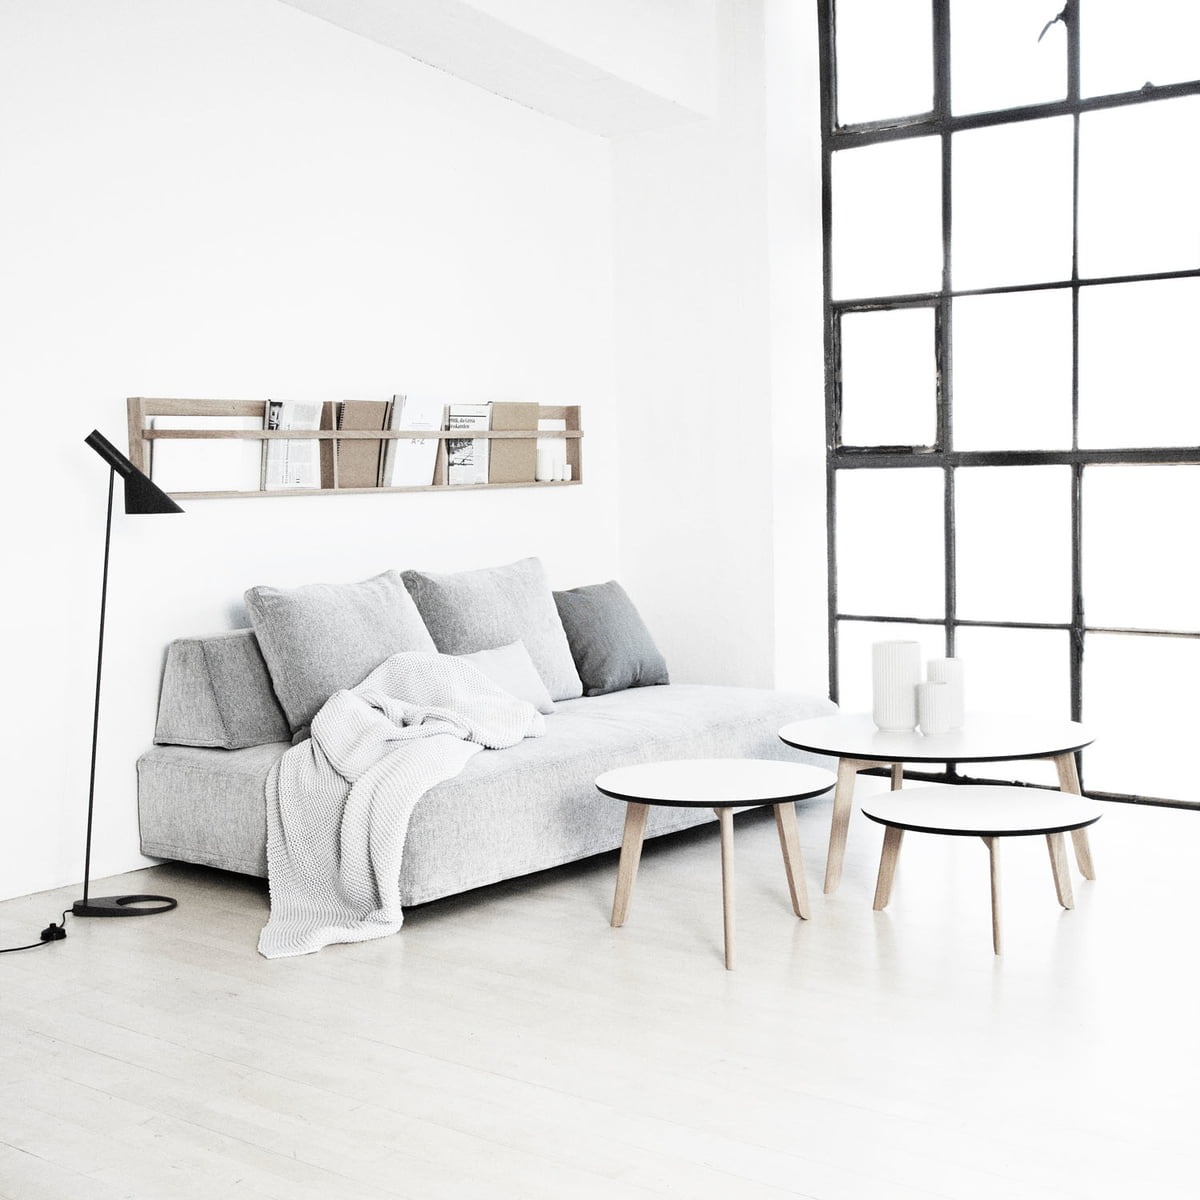 vega zeitschriftenhalter foxy potato shop. Black Bedroom Furniture Sets. Home Design Ideas